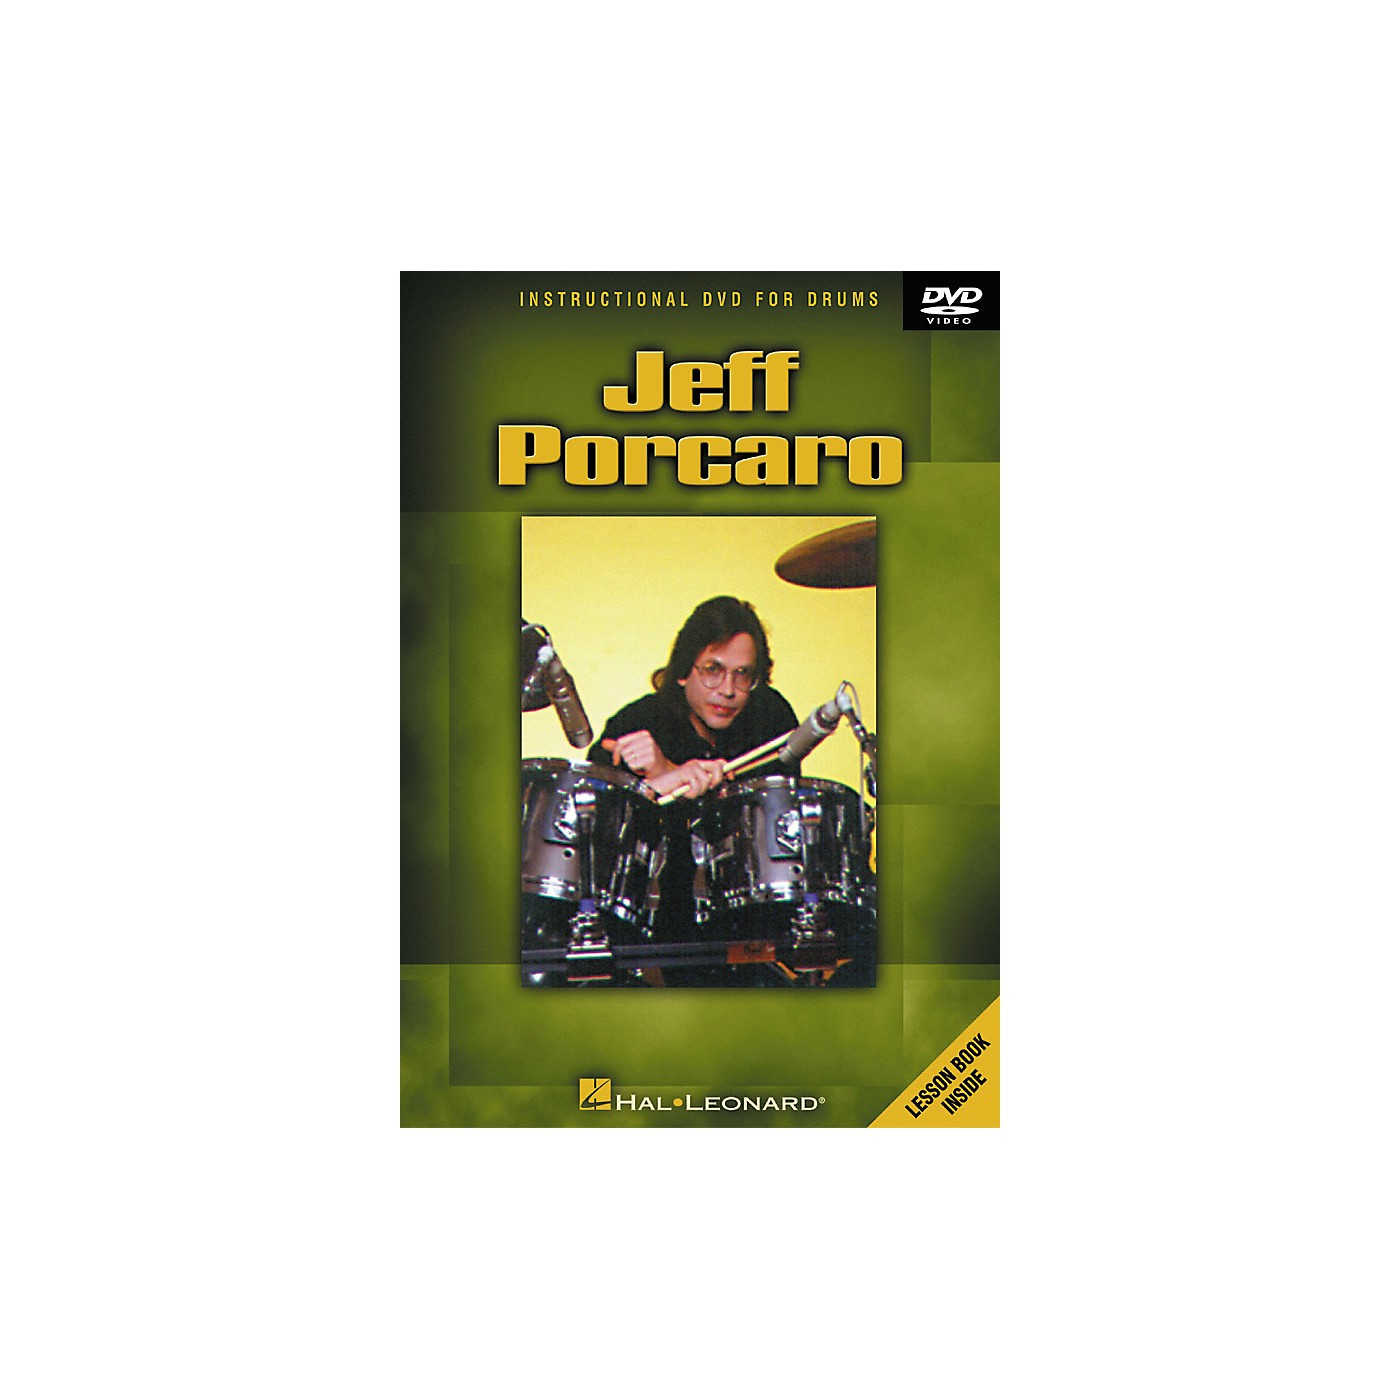 Hal Leonard Jeff Porcaro Drum DVD thumbnail